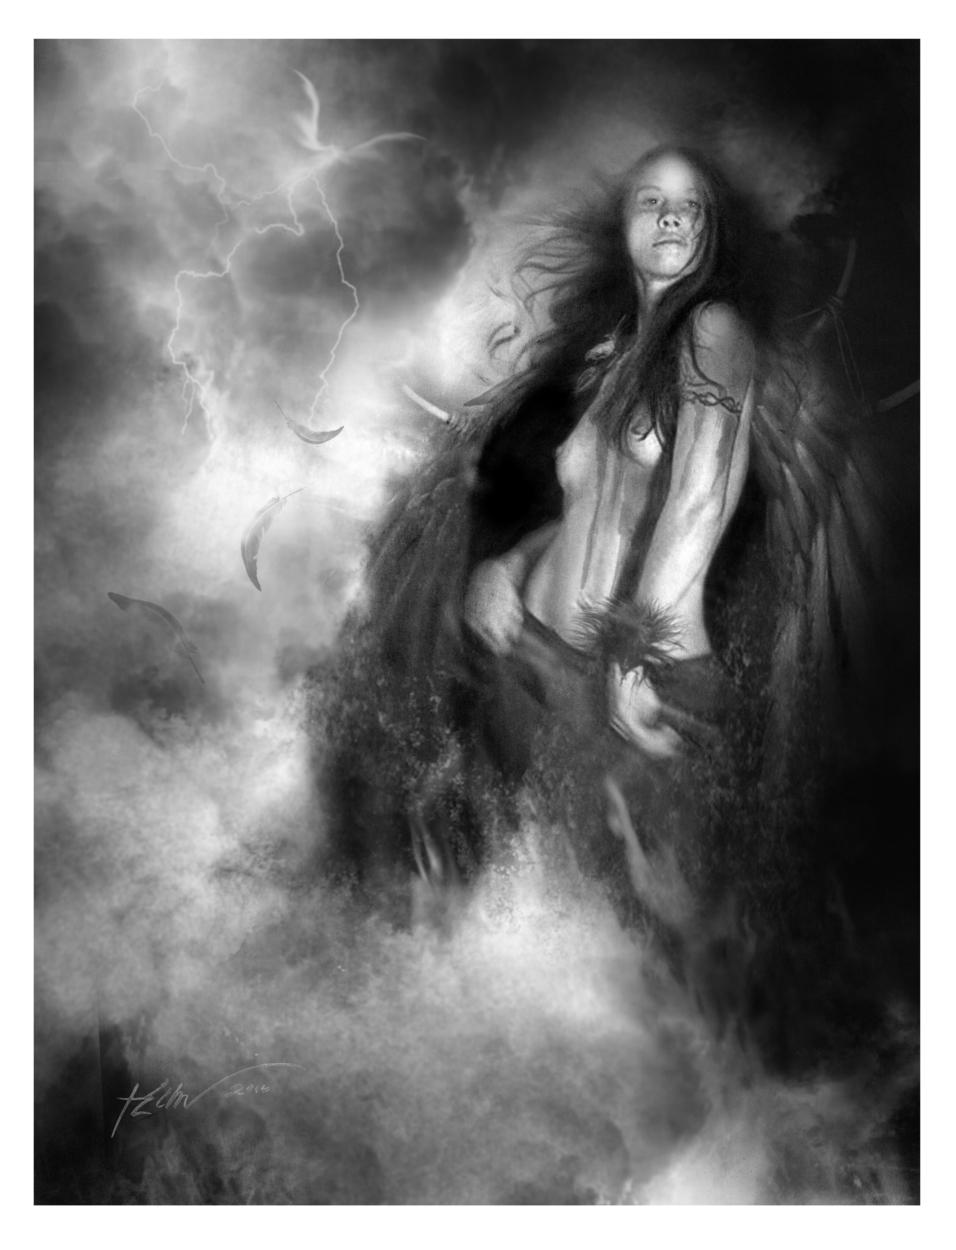 DANCE OF THE FIREDRAKE Artwork by Jeff Echevarria